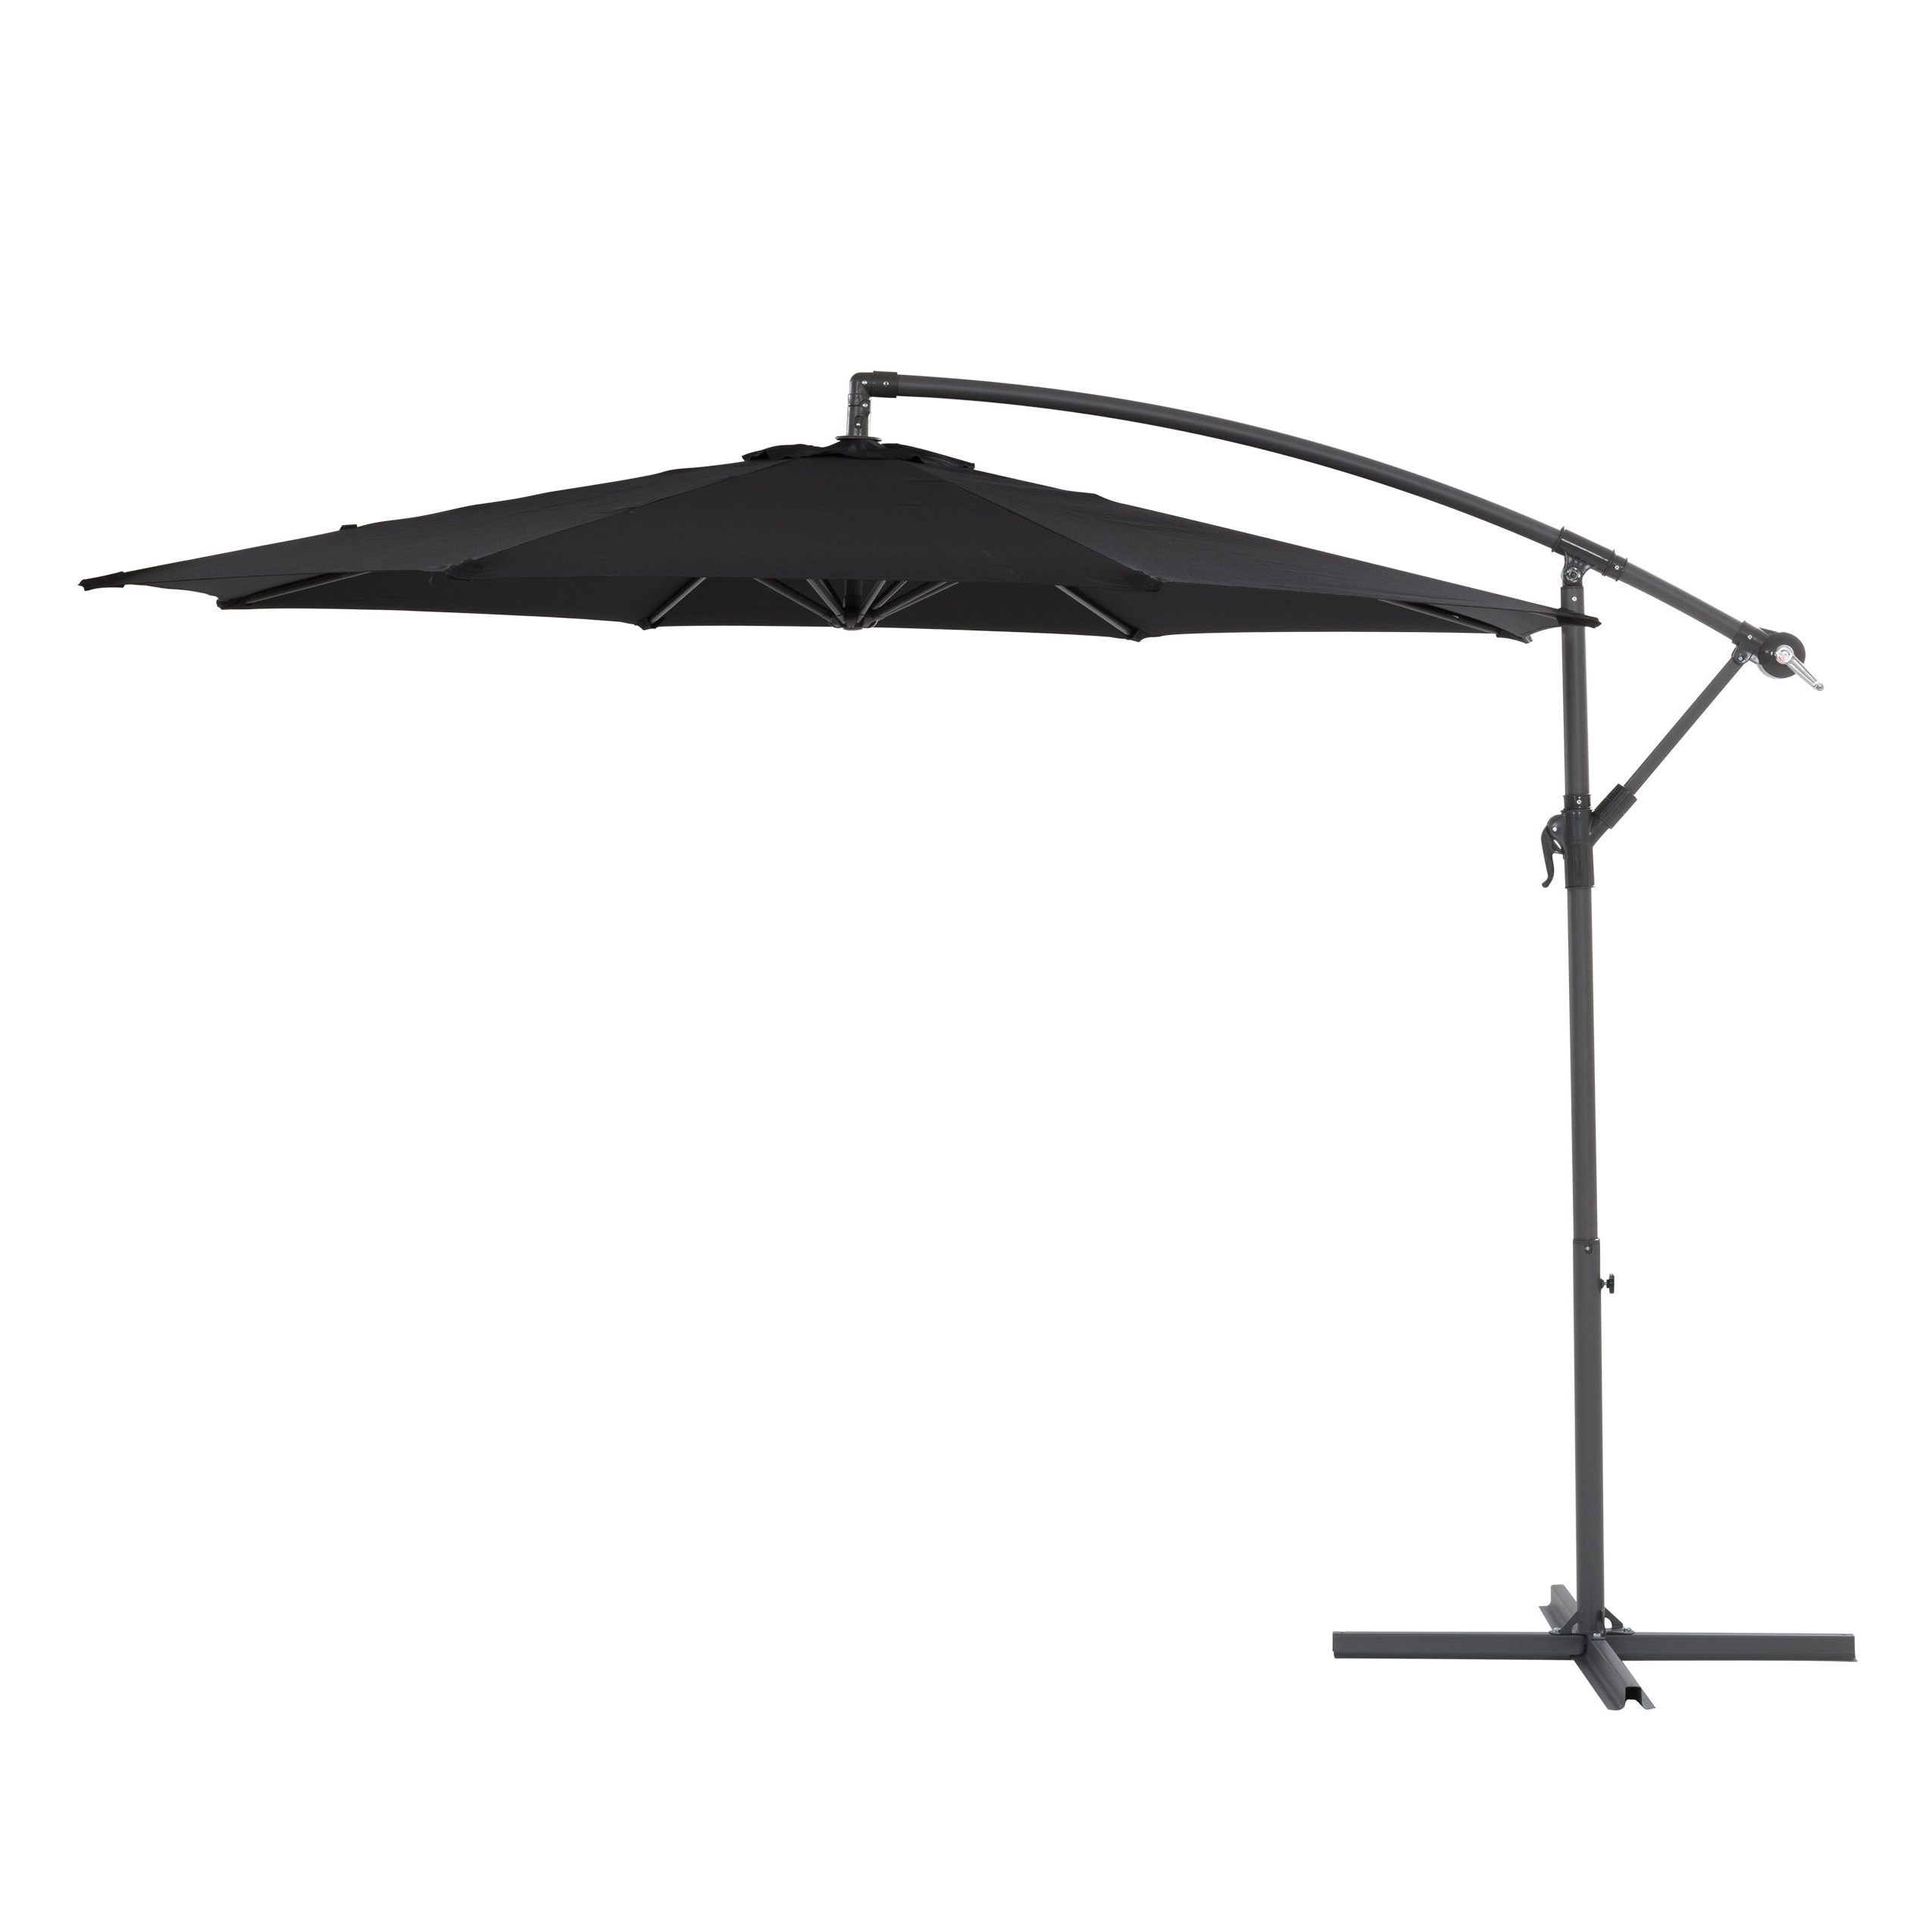 Fashionable Ketcham Cantilever Umbrellas Regarding Freda (View 17 of 20)